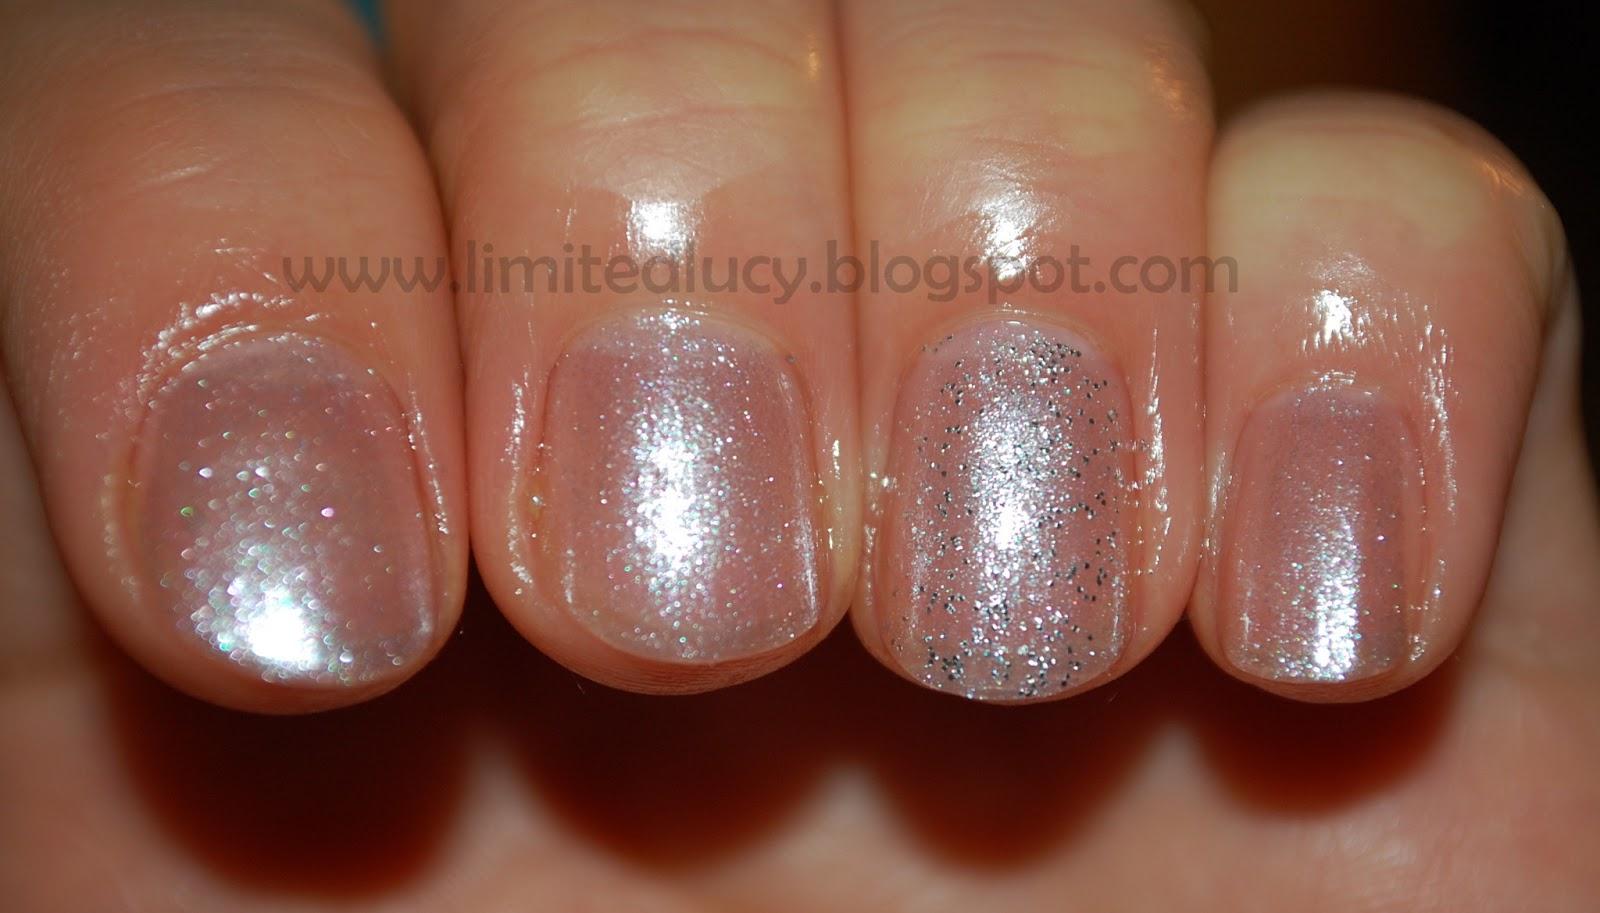 LUCY brb: Deborah Lippmann: Whatever Lola Wants - nail polish swatch ...